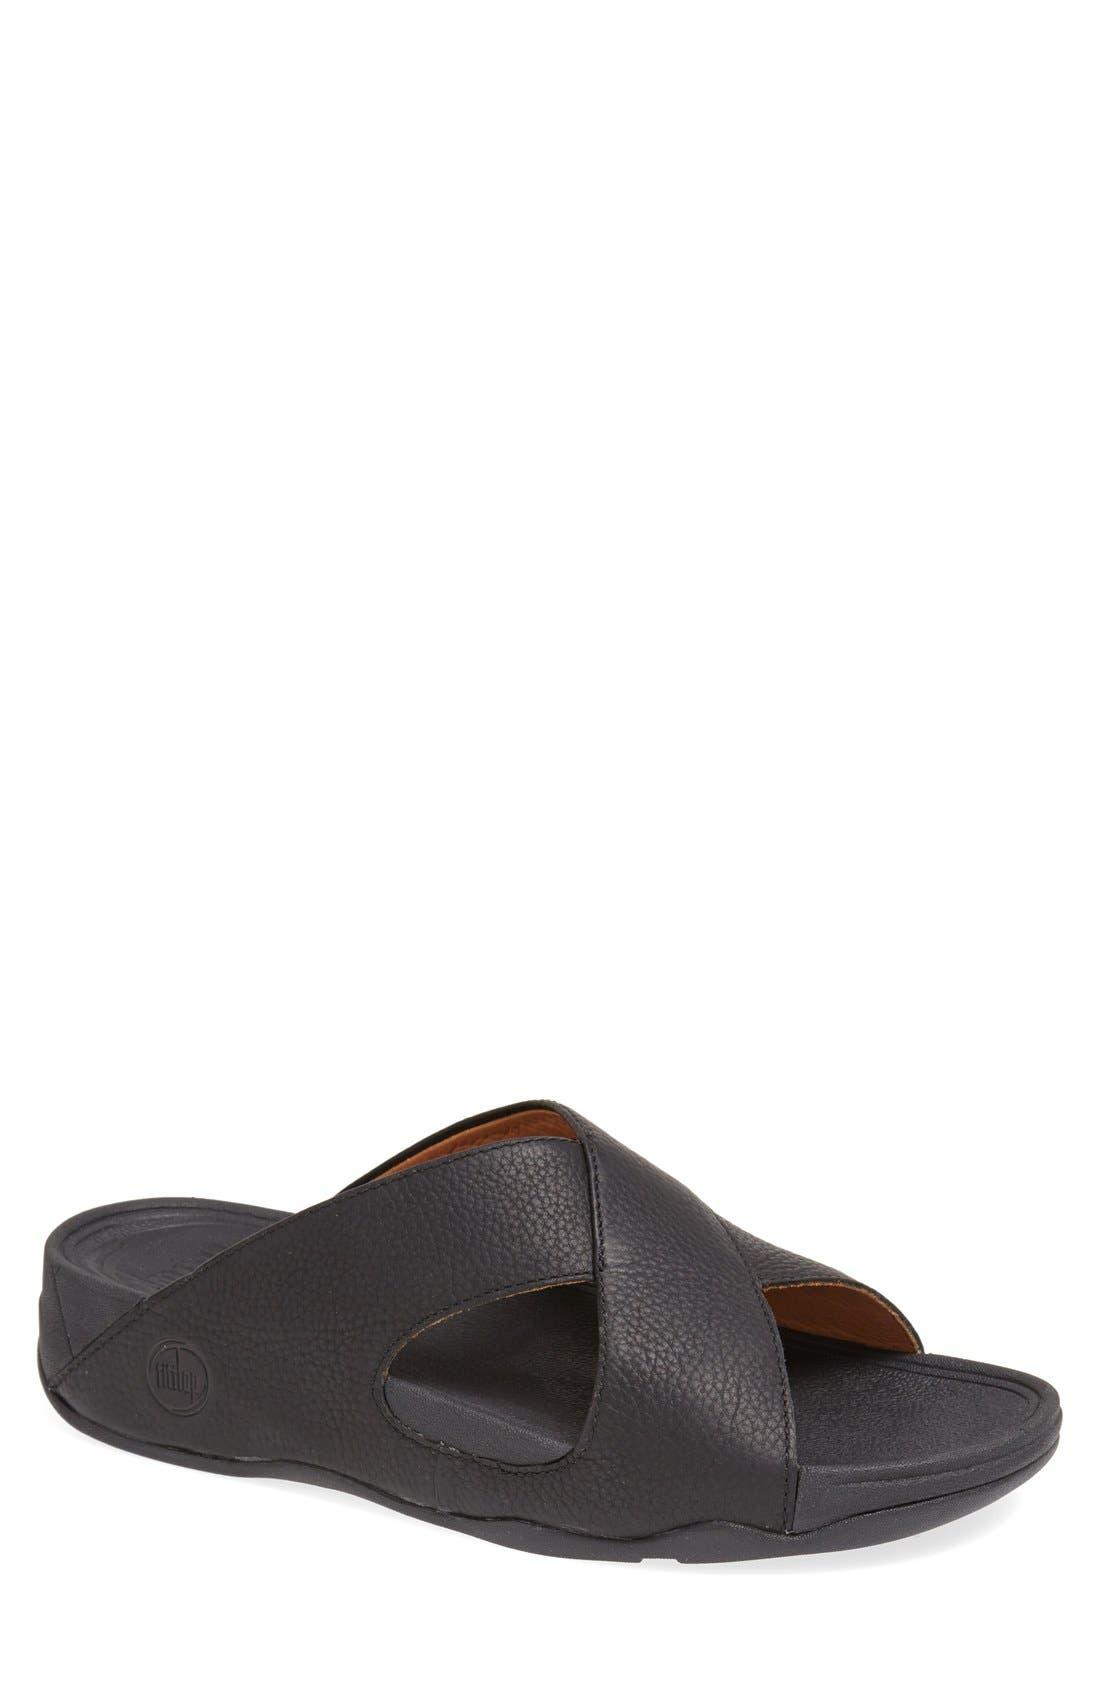 Xosa<sup>™</sup> Leather Slide Sandal,                         Main,                         color, 001